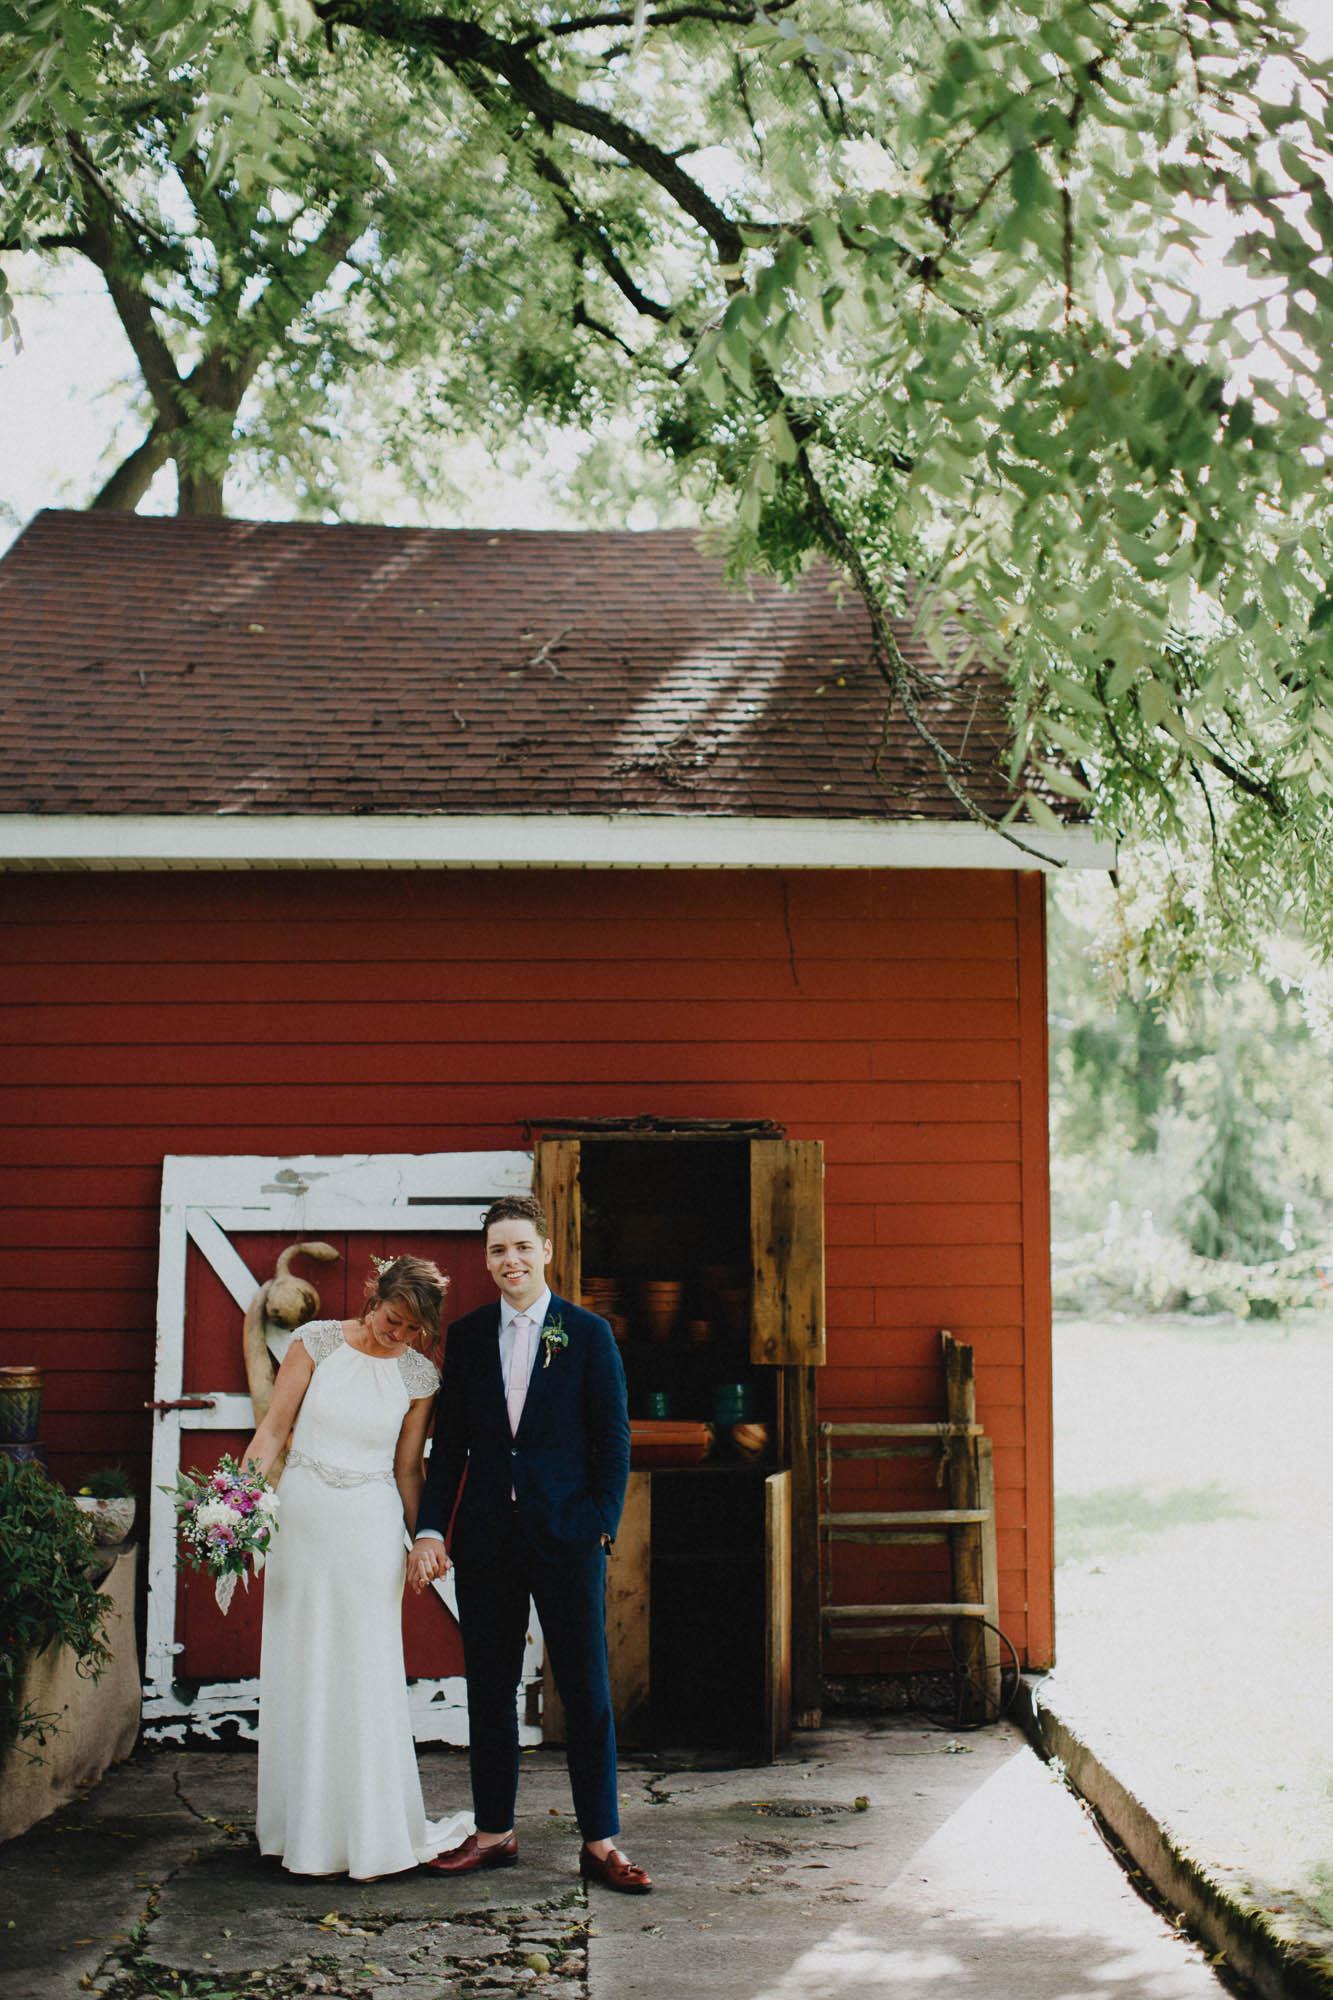 Leah-Graham-Michigan-Outdoor-DIY-Wedding-072@2x.jpg